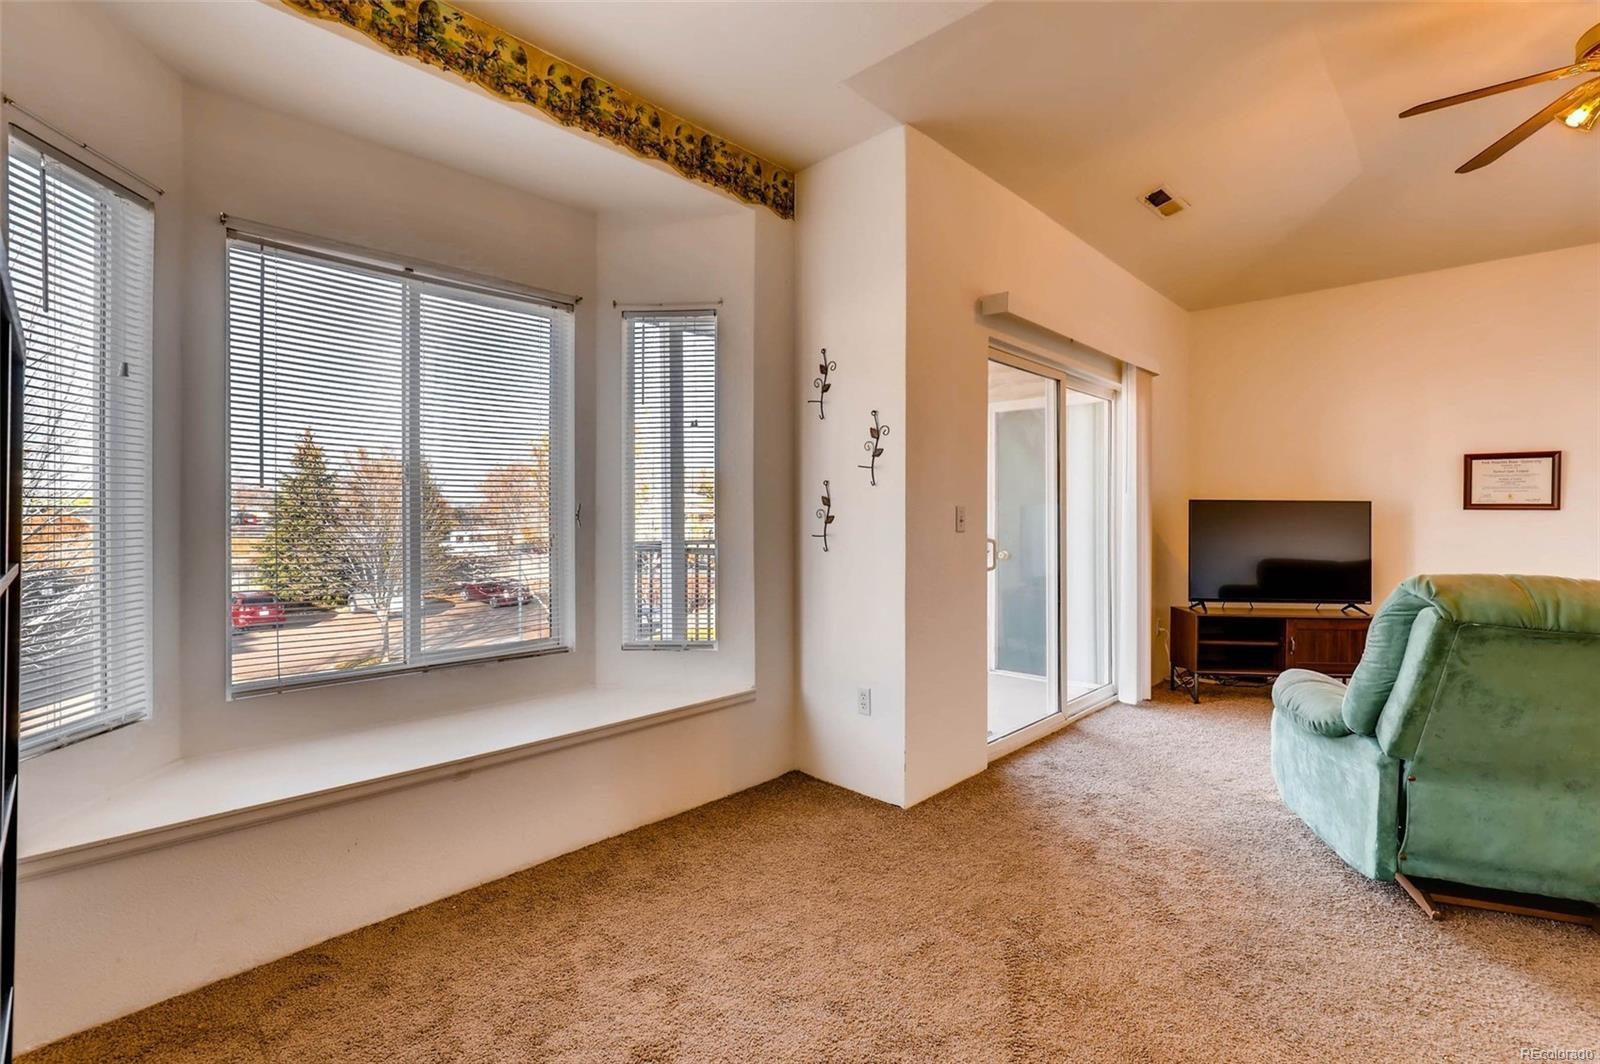 MLS# 9808696 - 9 - 2049 Legacy Ridge View, Colorado Springs, CO 80910